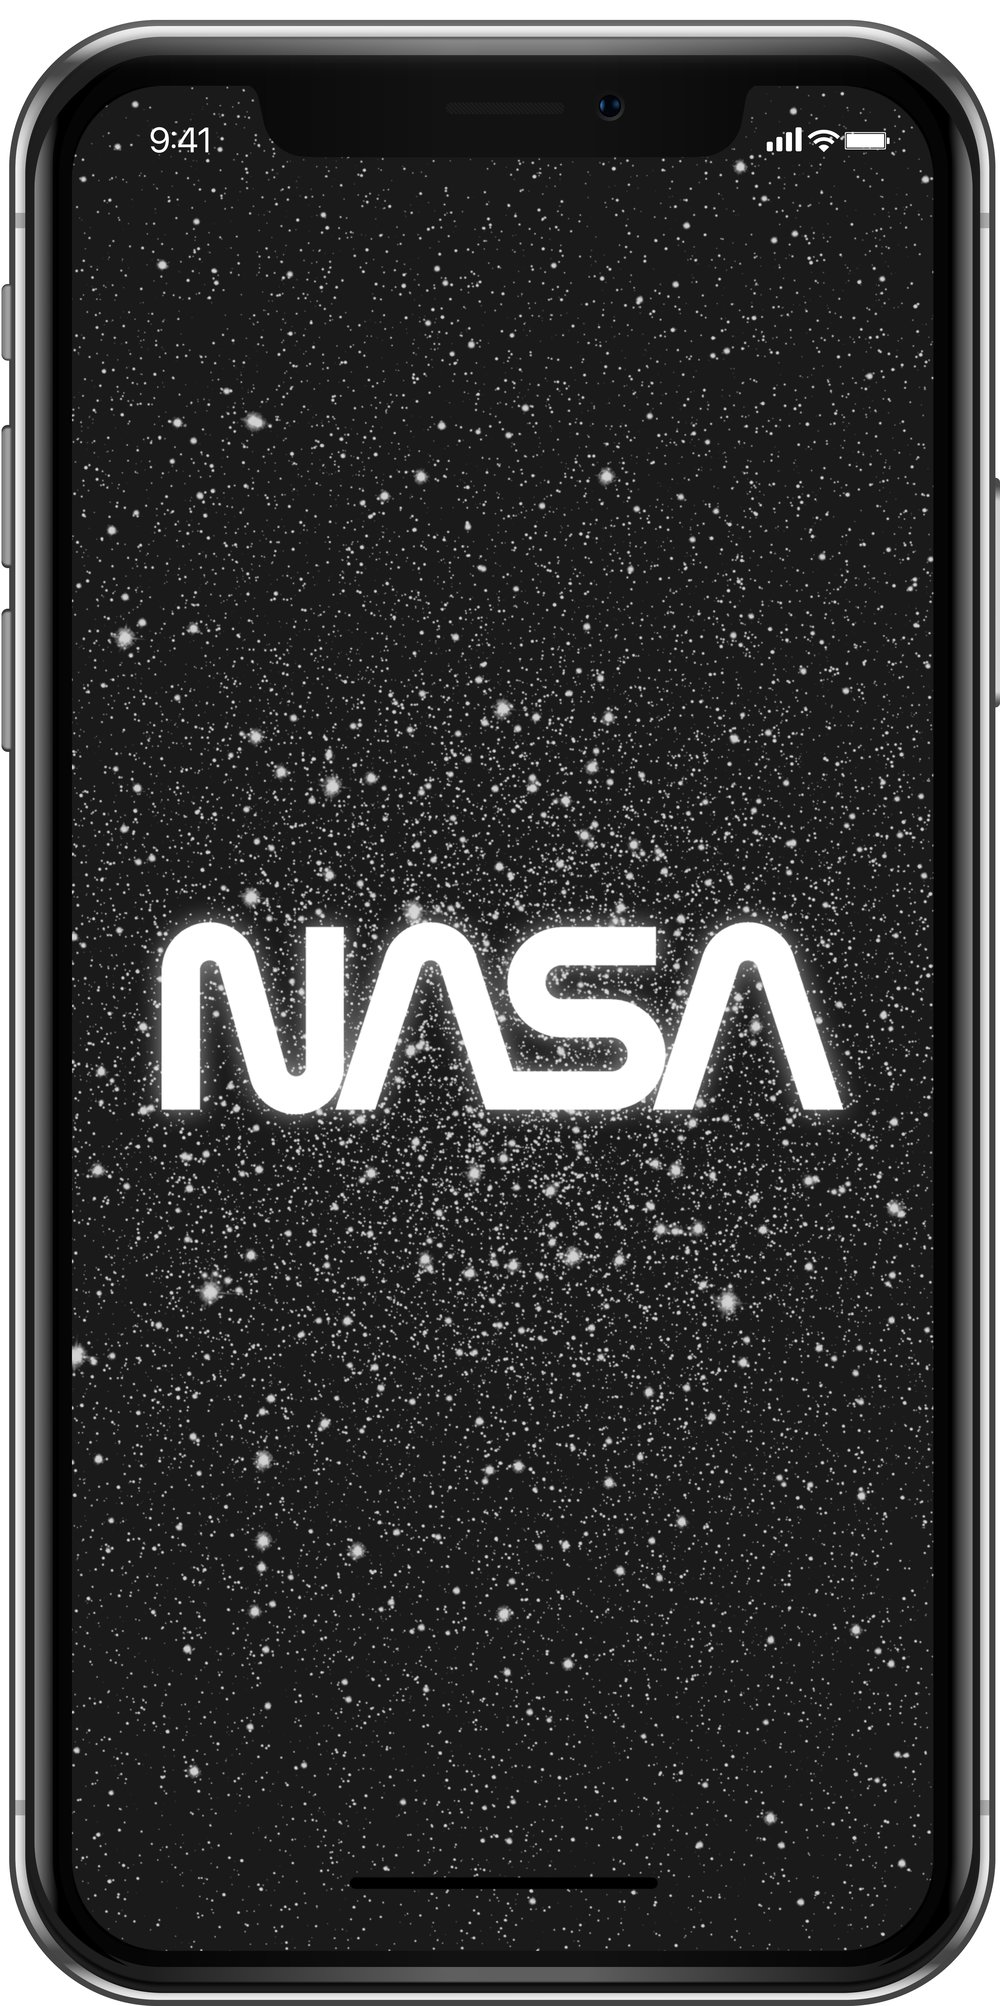 iPhone X (mockup)PHONE SCREEN copy.jpg